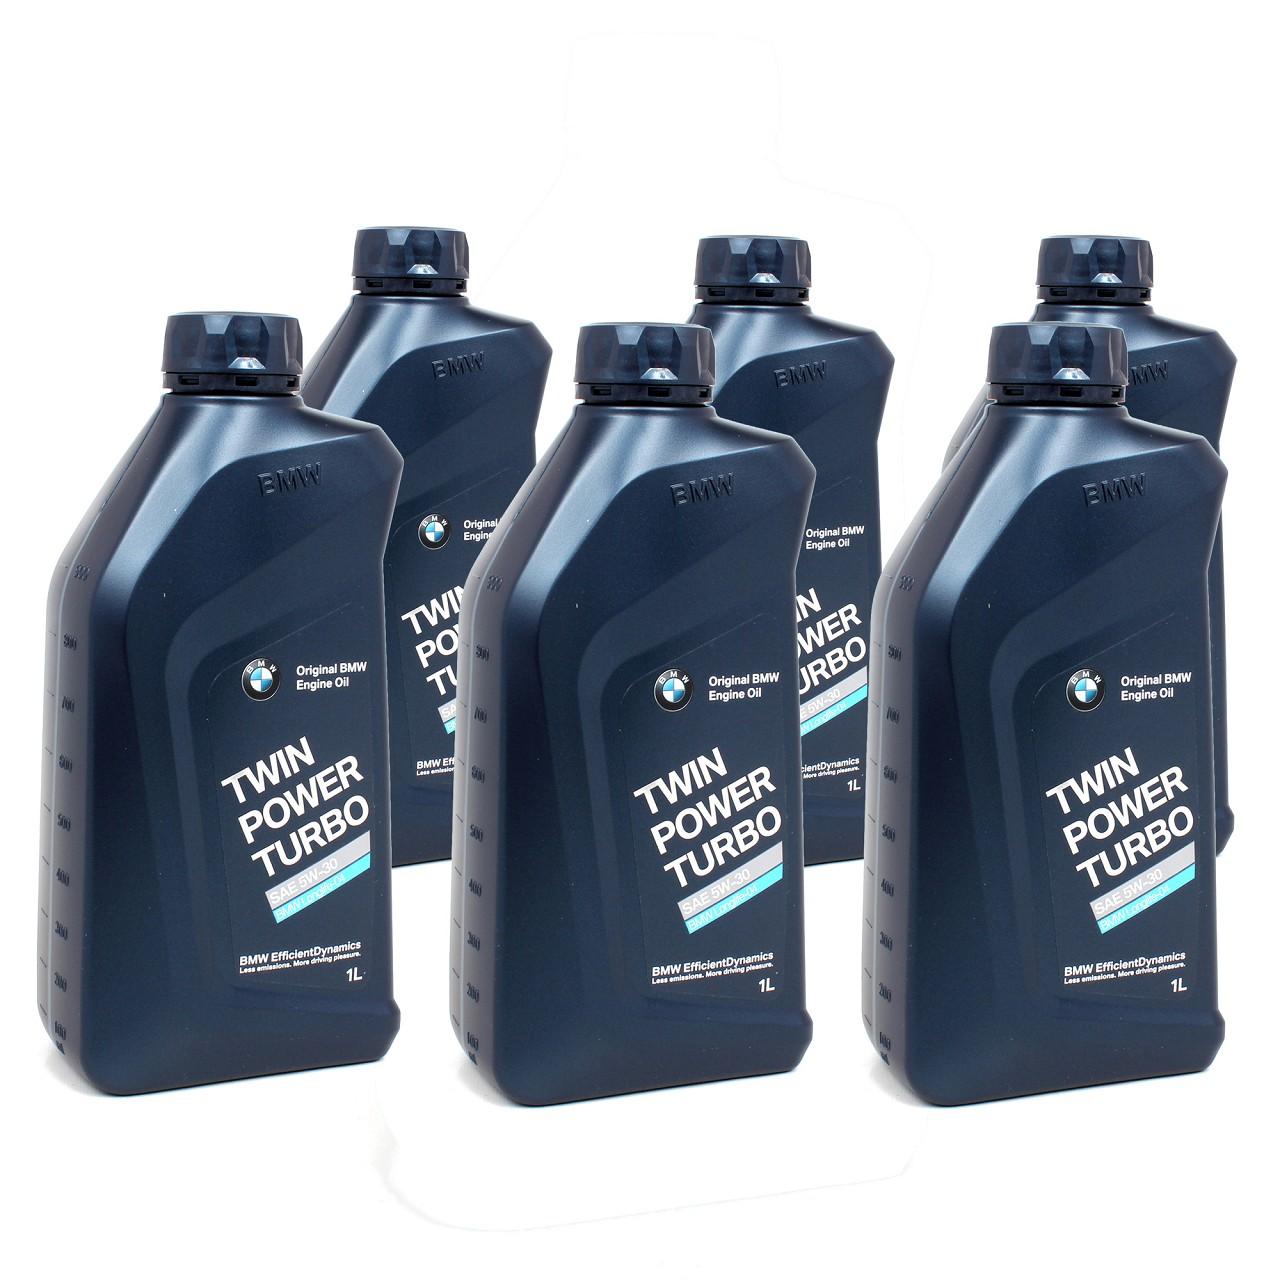 ORIGINAL BMW Motoröl Öl 5W30 Twin Power Turbo LongLife-04 6 Liter 83212465849